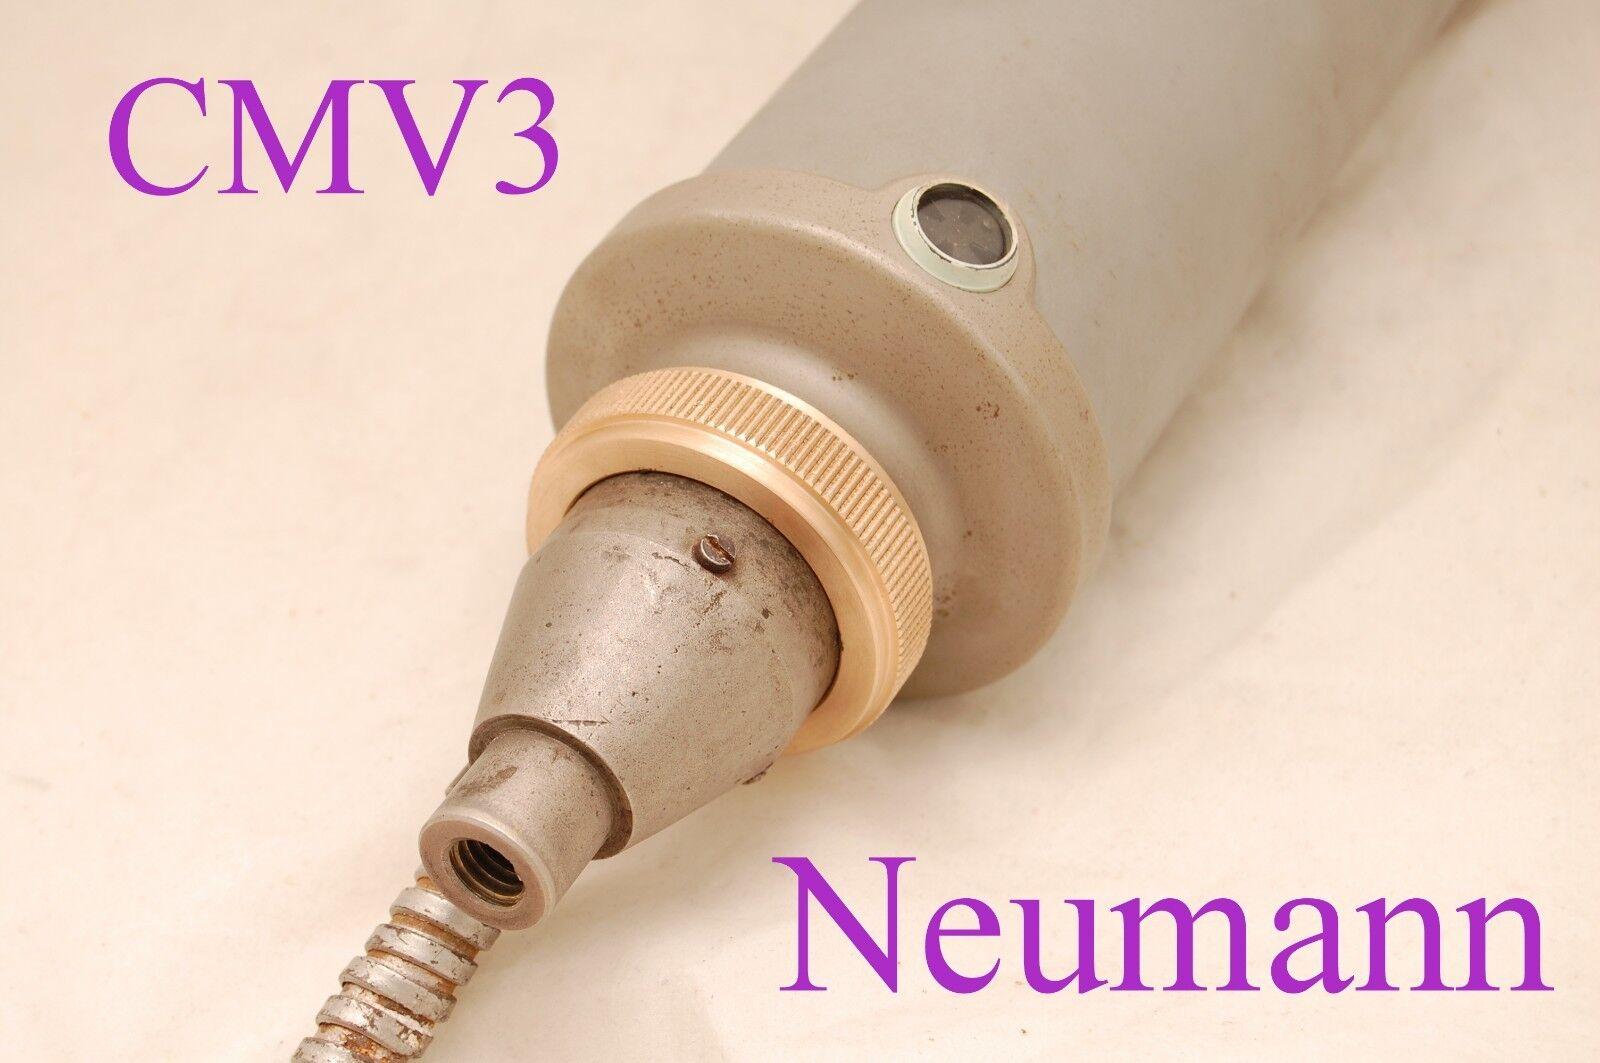 Washer  Cup for Vintage Neumann or Telefunken CMV3 and RFT CM 7151 Microphones